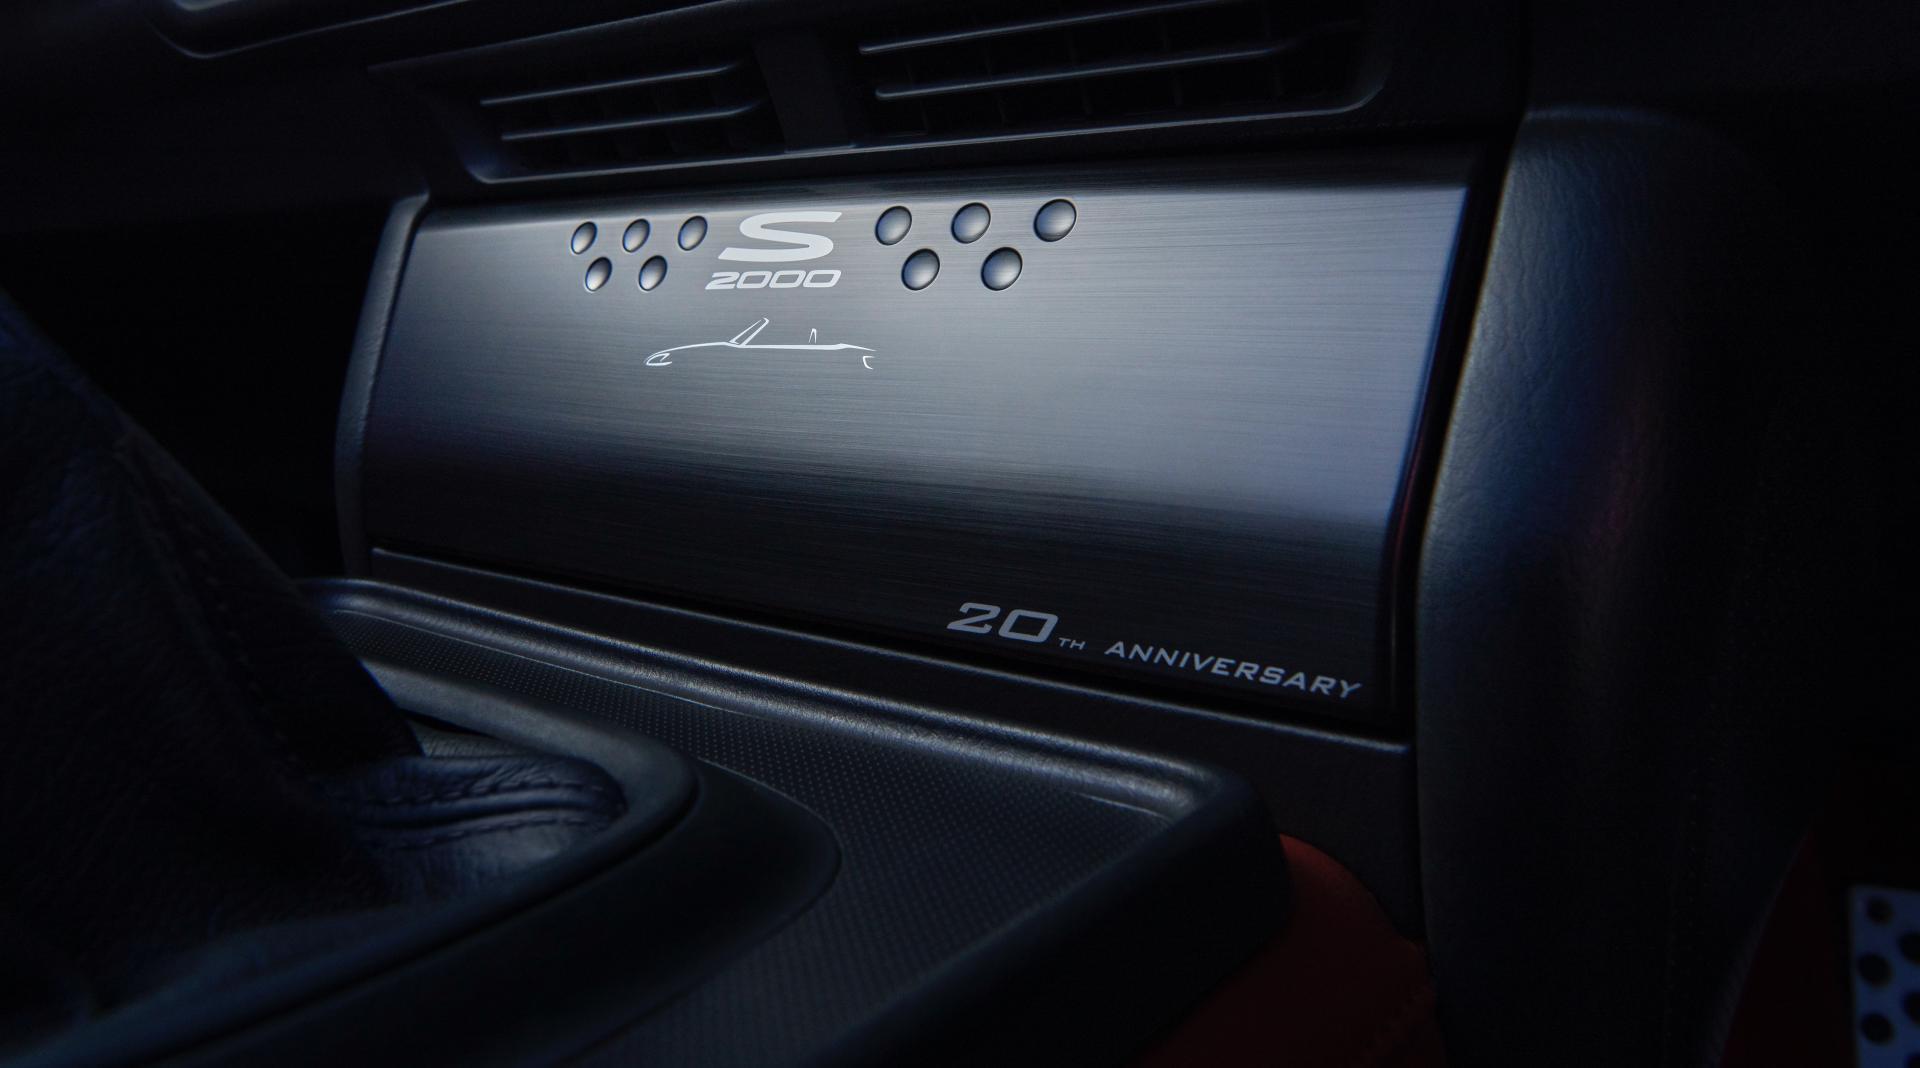 Honda-S2000-20th-Anniversary-genuine-accessories-14